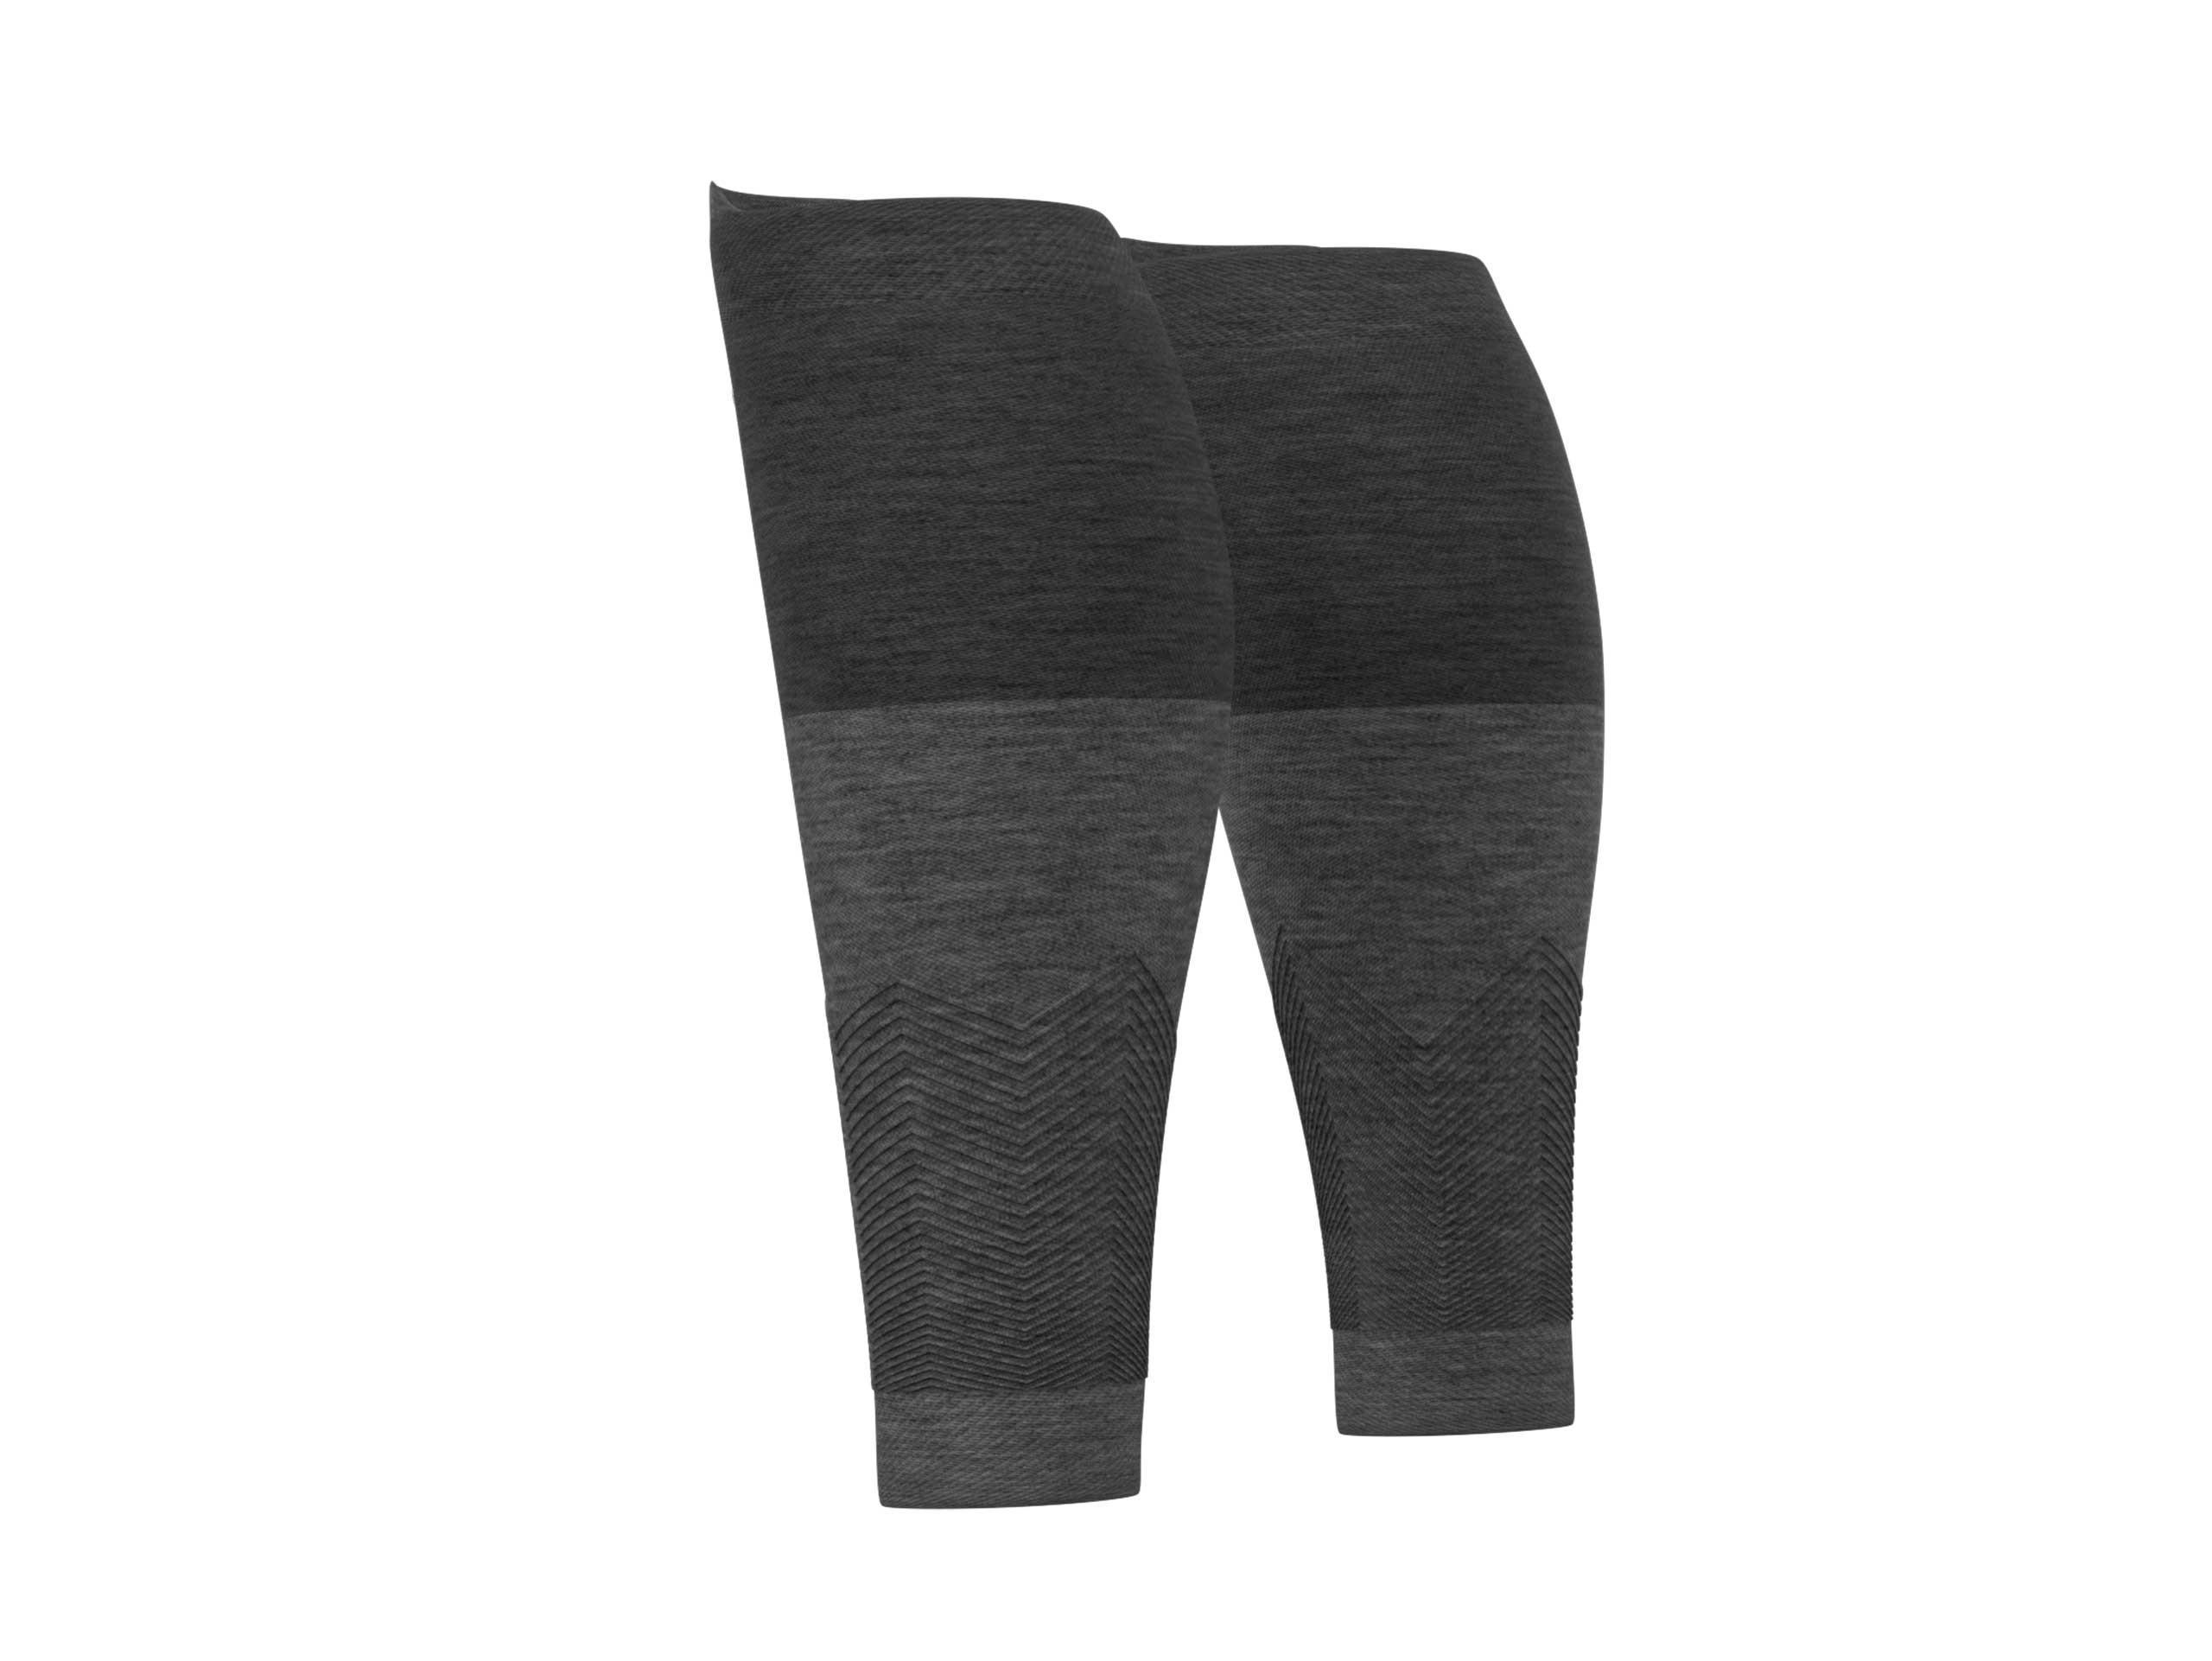 R2v2 manchon compression gris